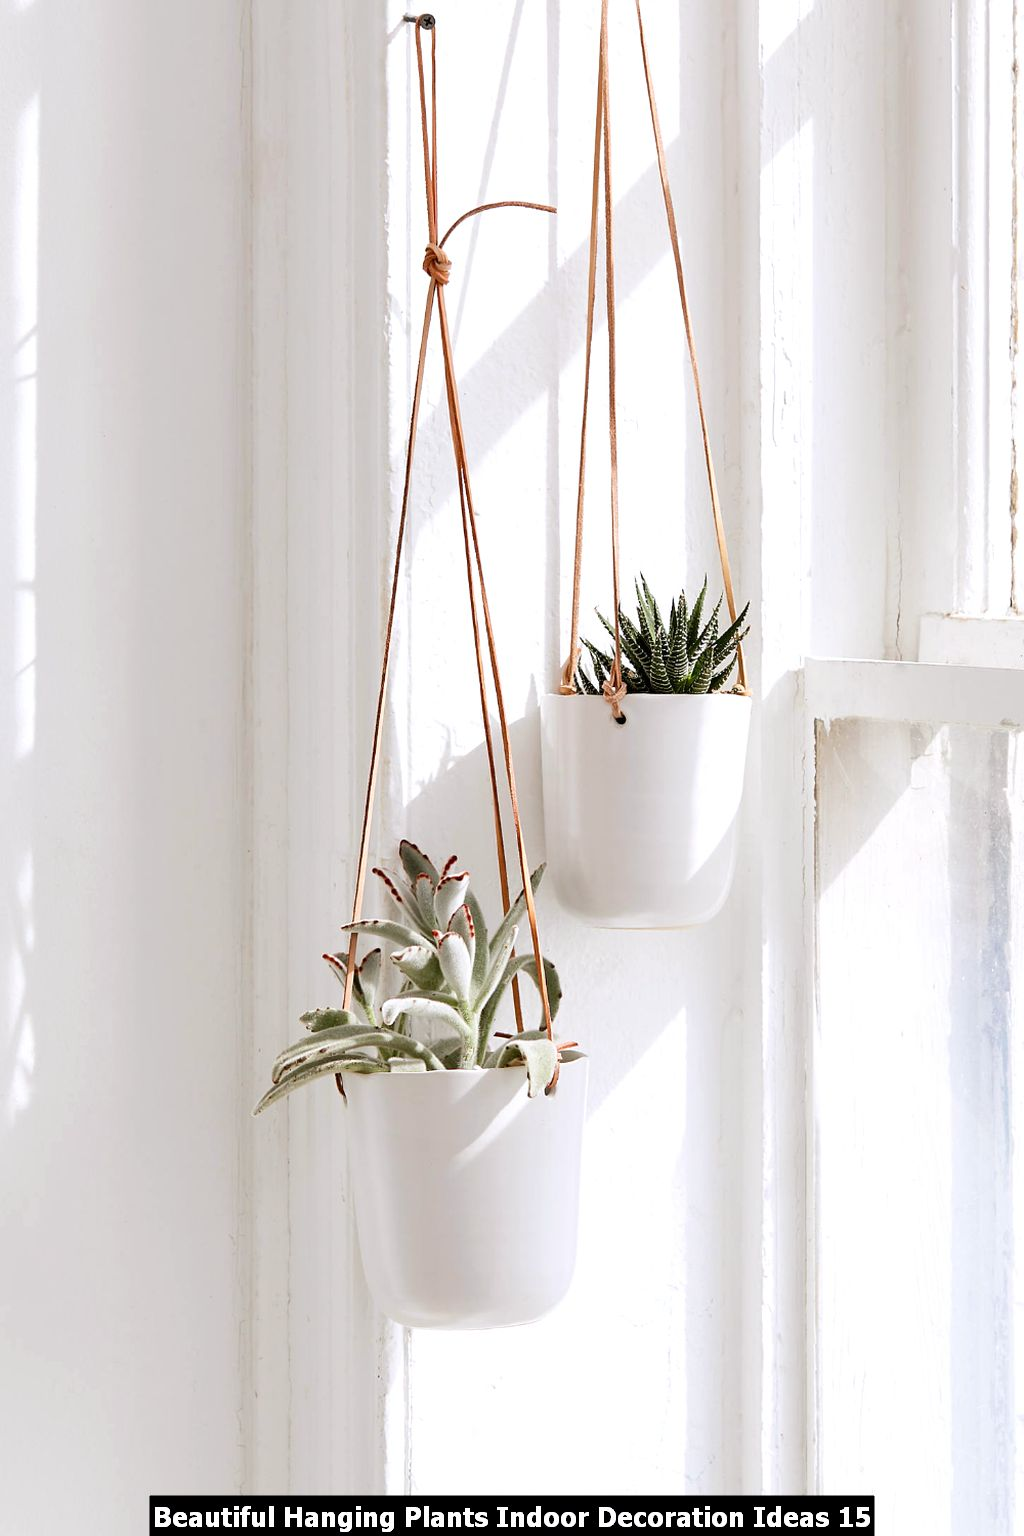 Beautiful Hanging Plants Indoor Decoration Ideas 15